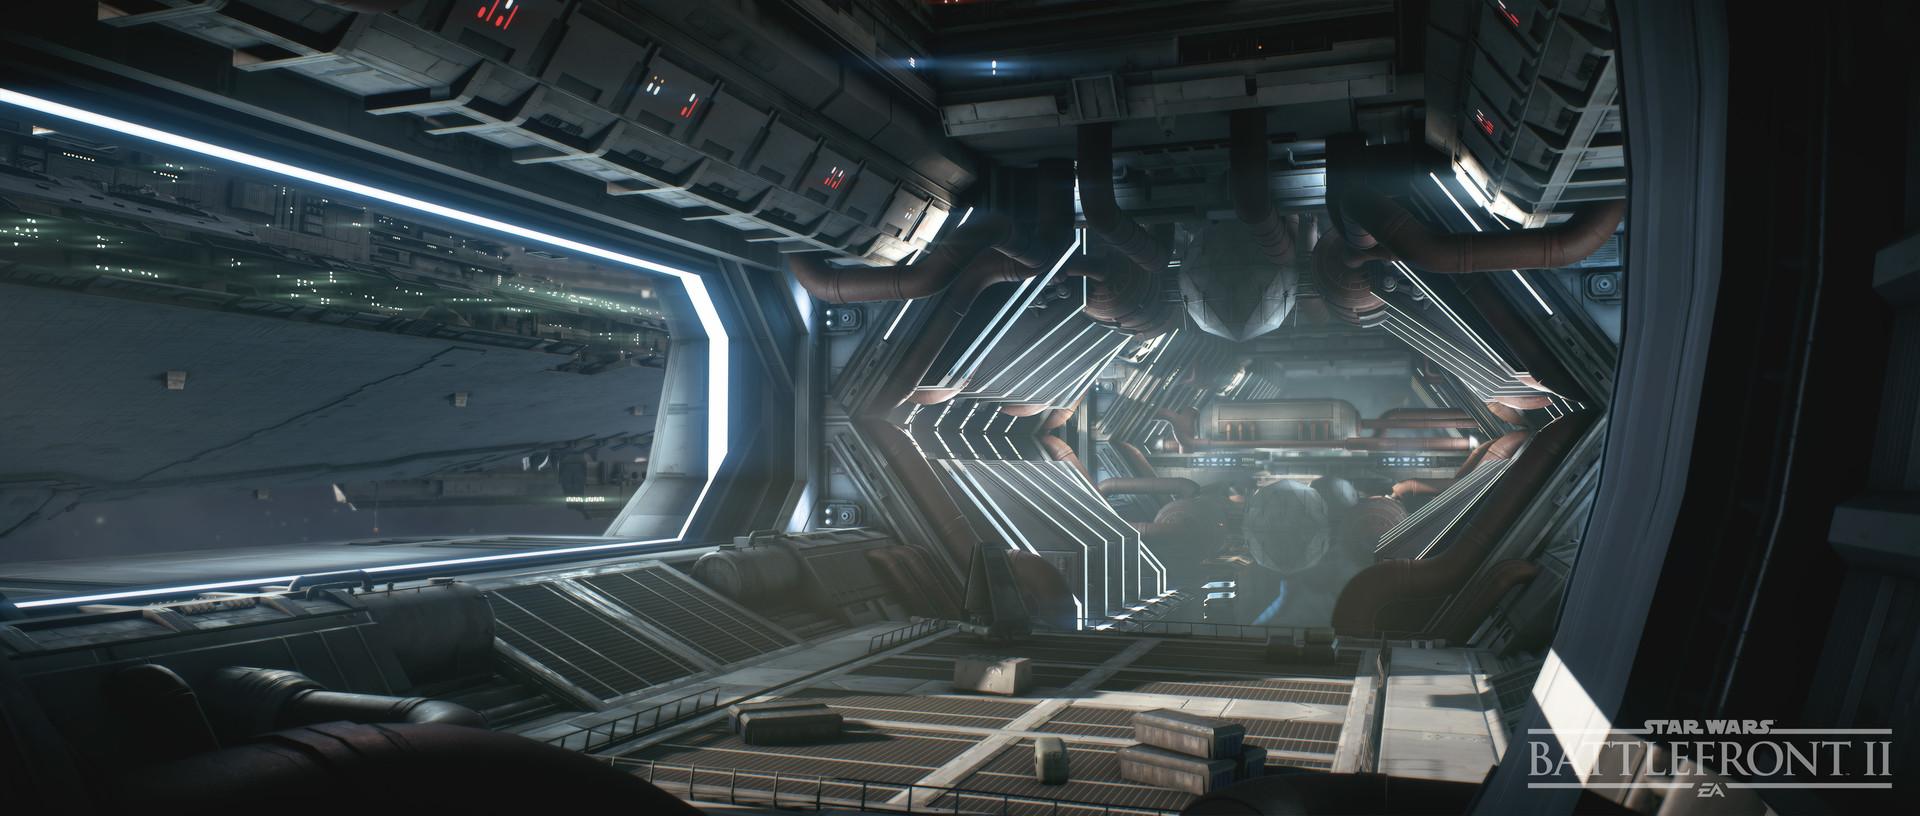 Darius kalinauskas fondor dock starwars conceptart battlefront 8